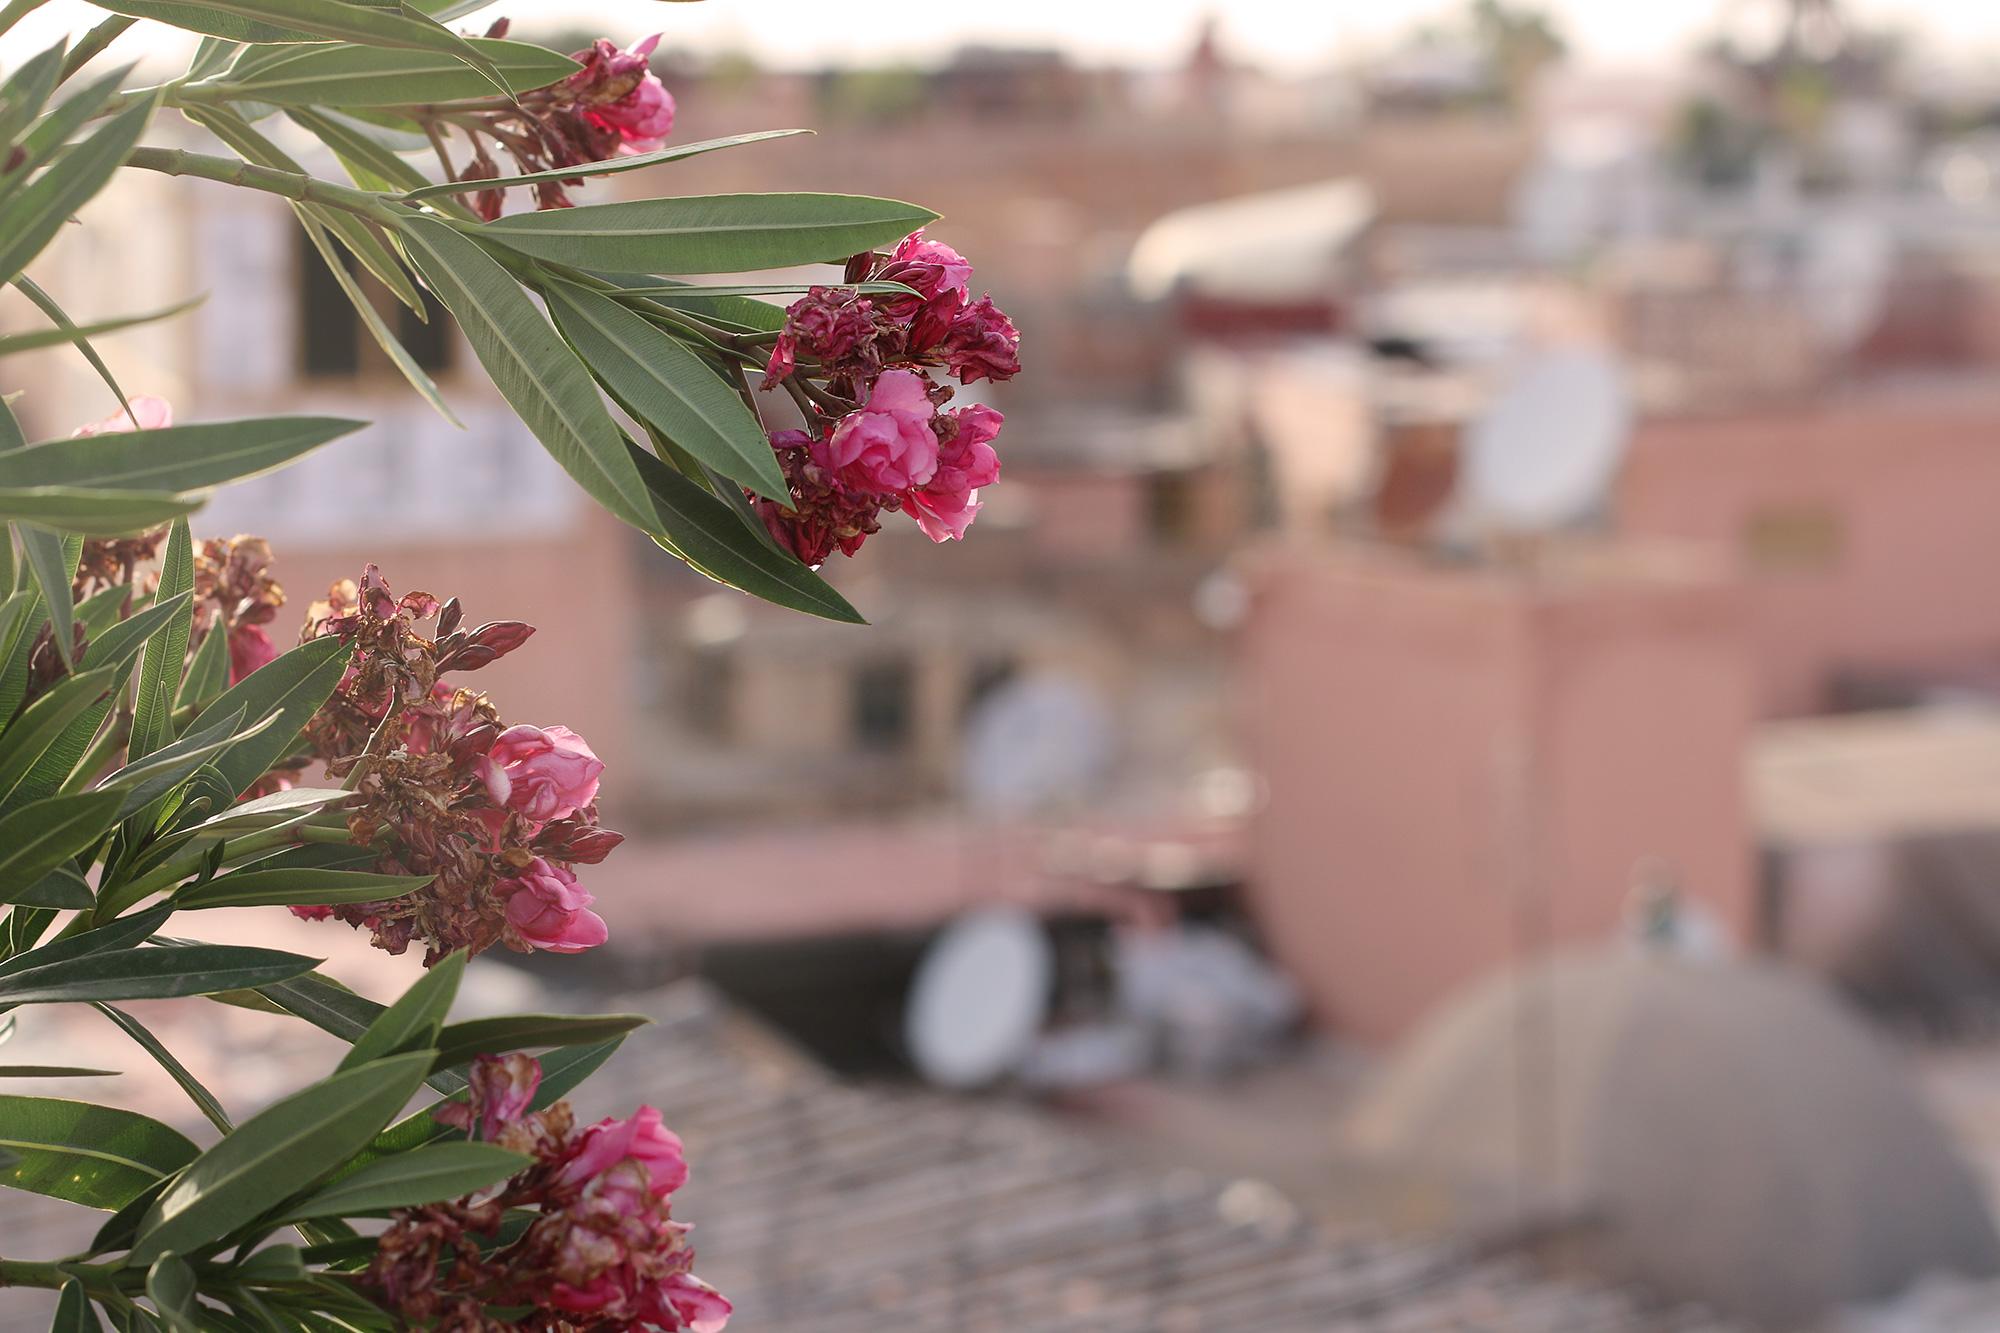 Marrakech-Travel-Tips-12